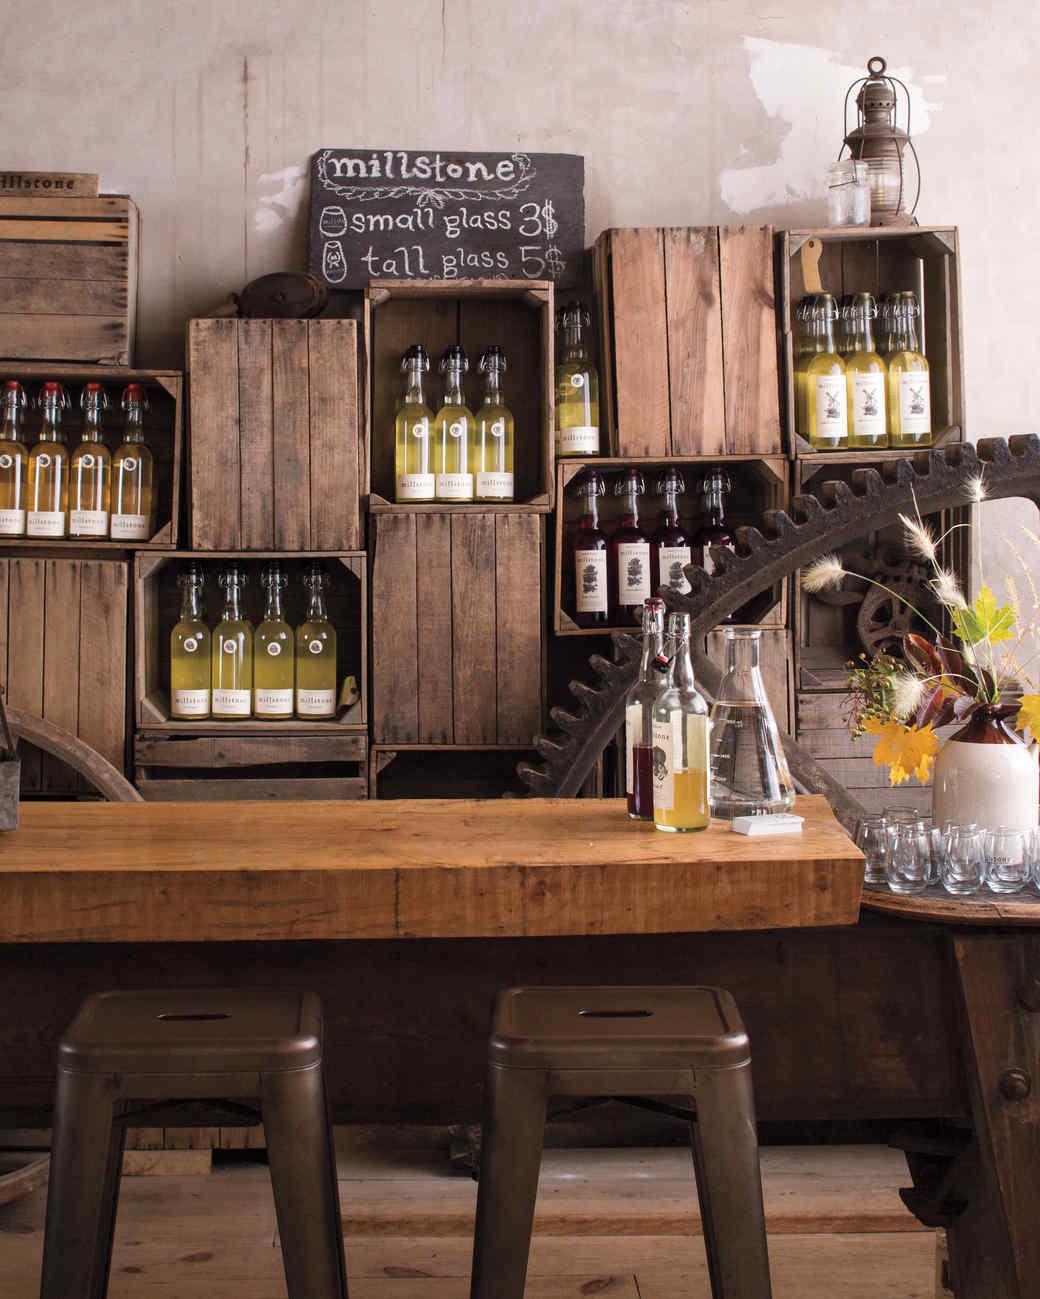 millstone-cider-tasting-bar-381-d111700.jpg